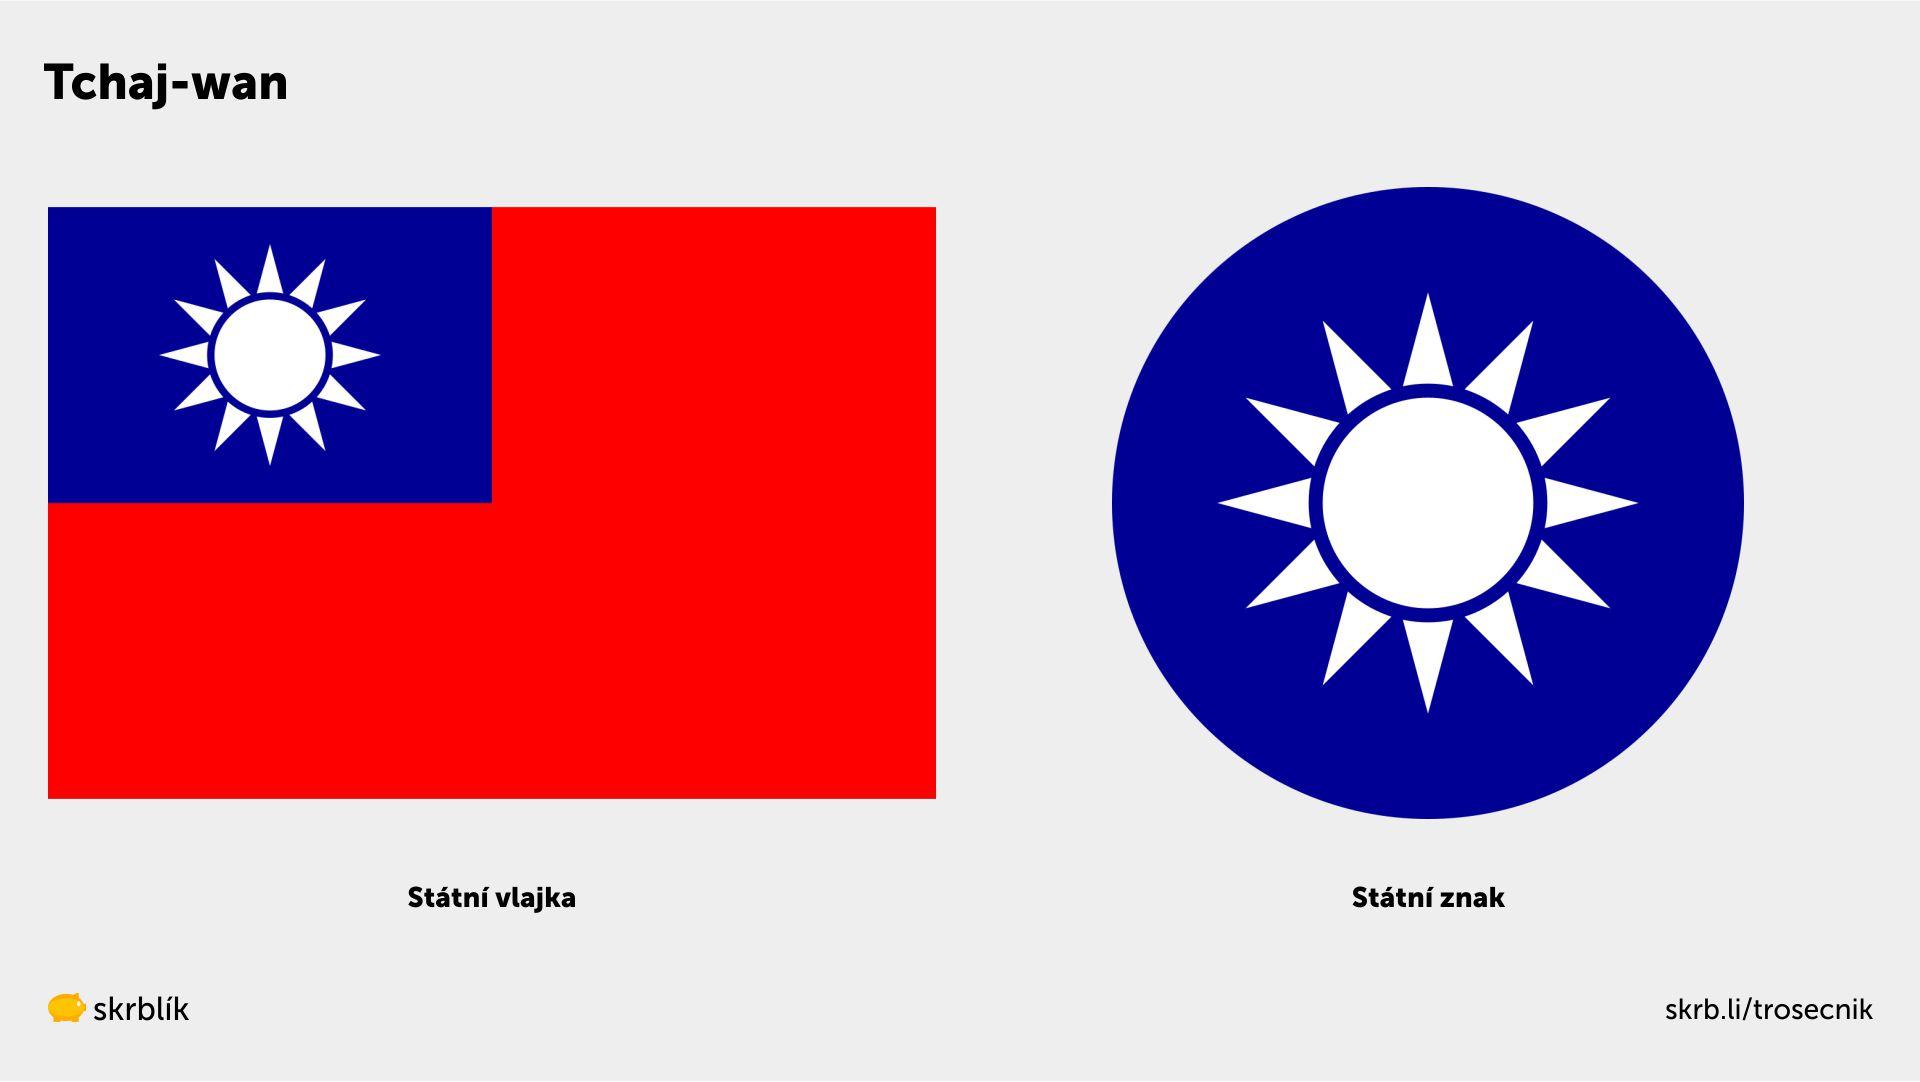 Tchaj-wan